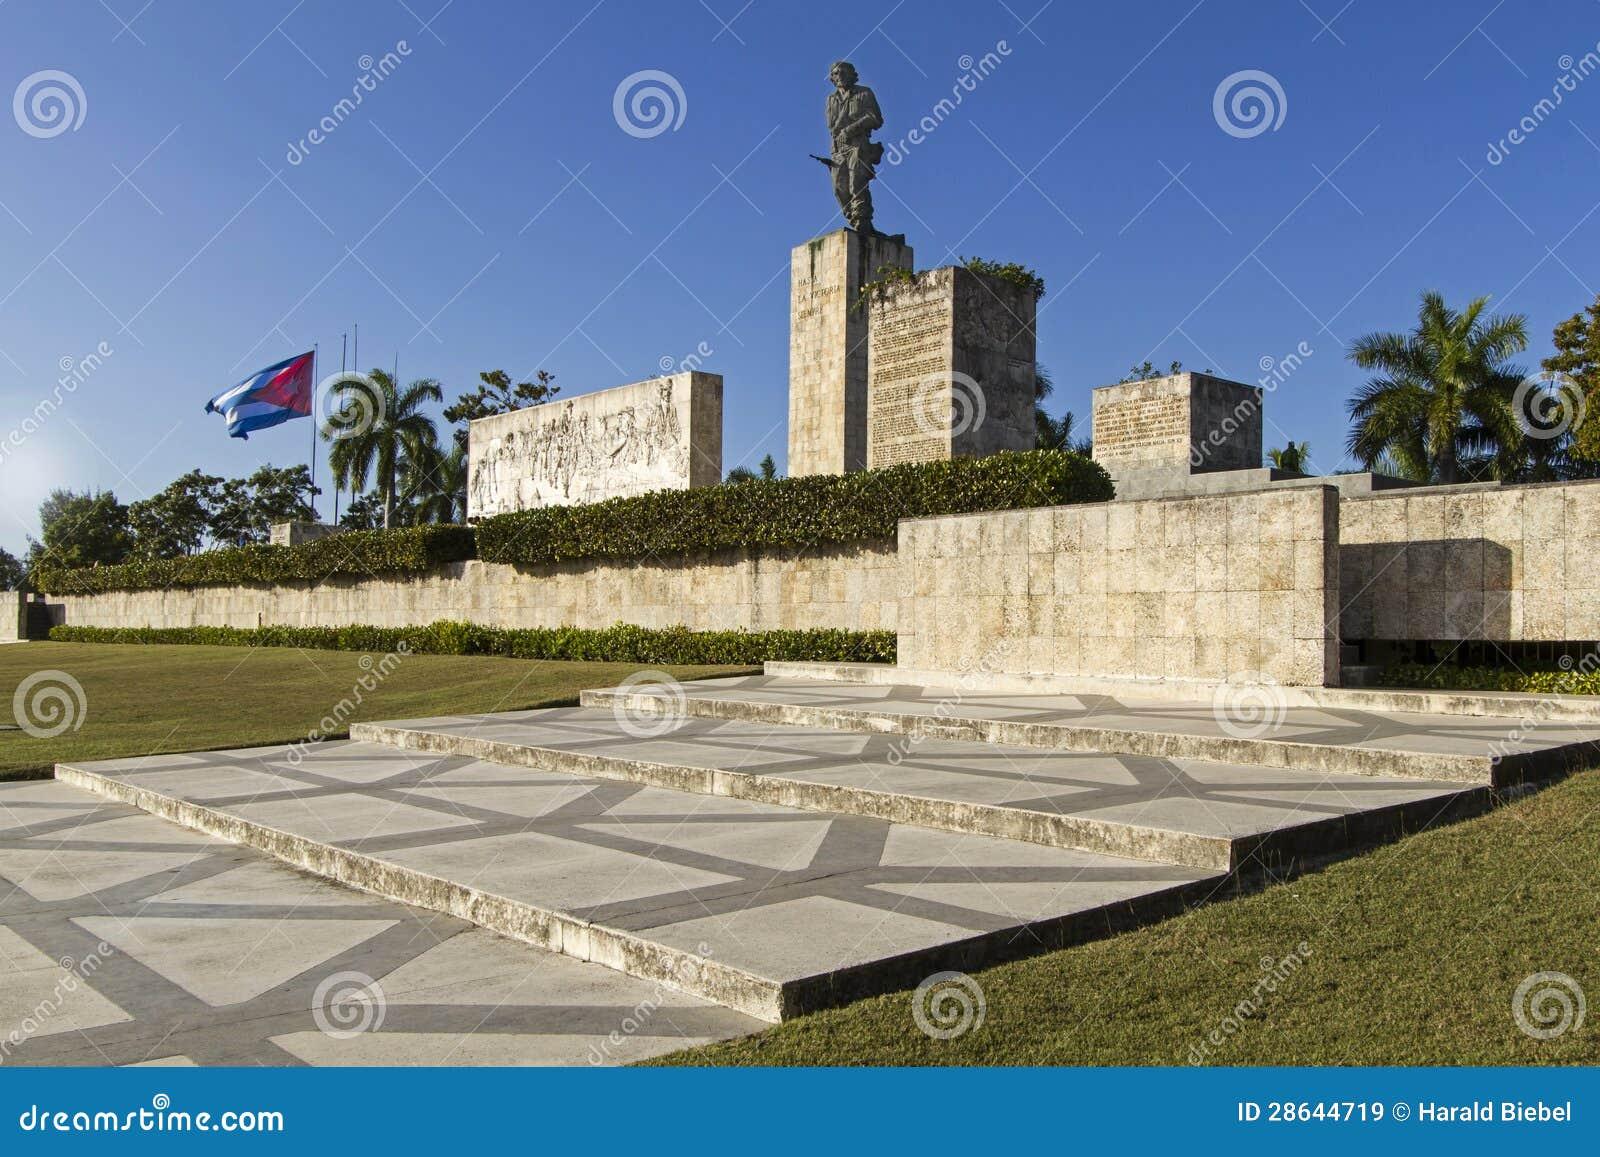 Monumento Pamiątkowy Che Guevara, Kuba